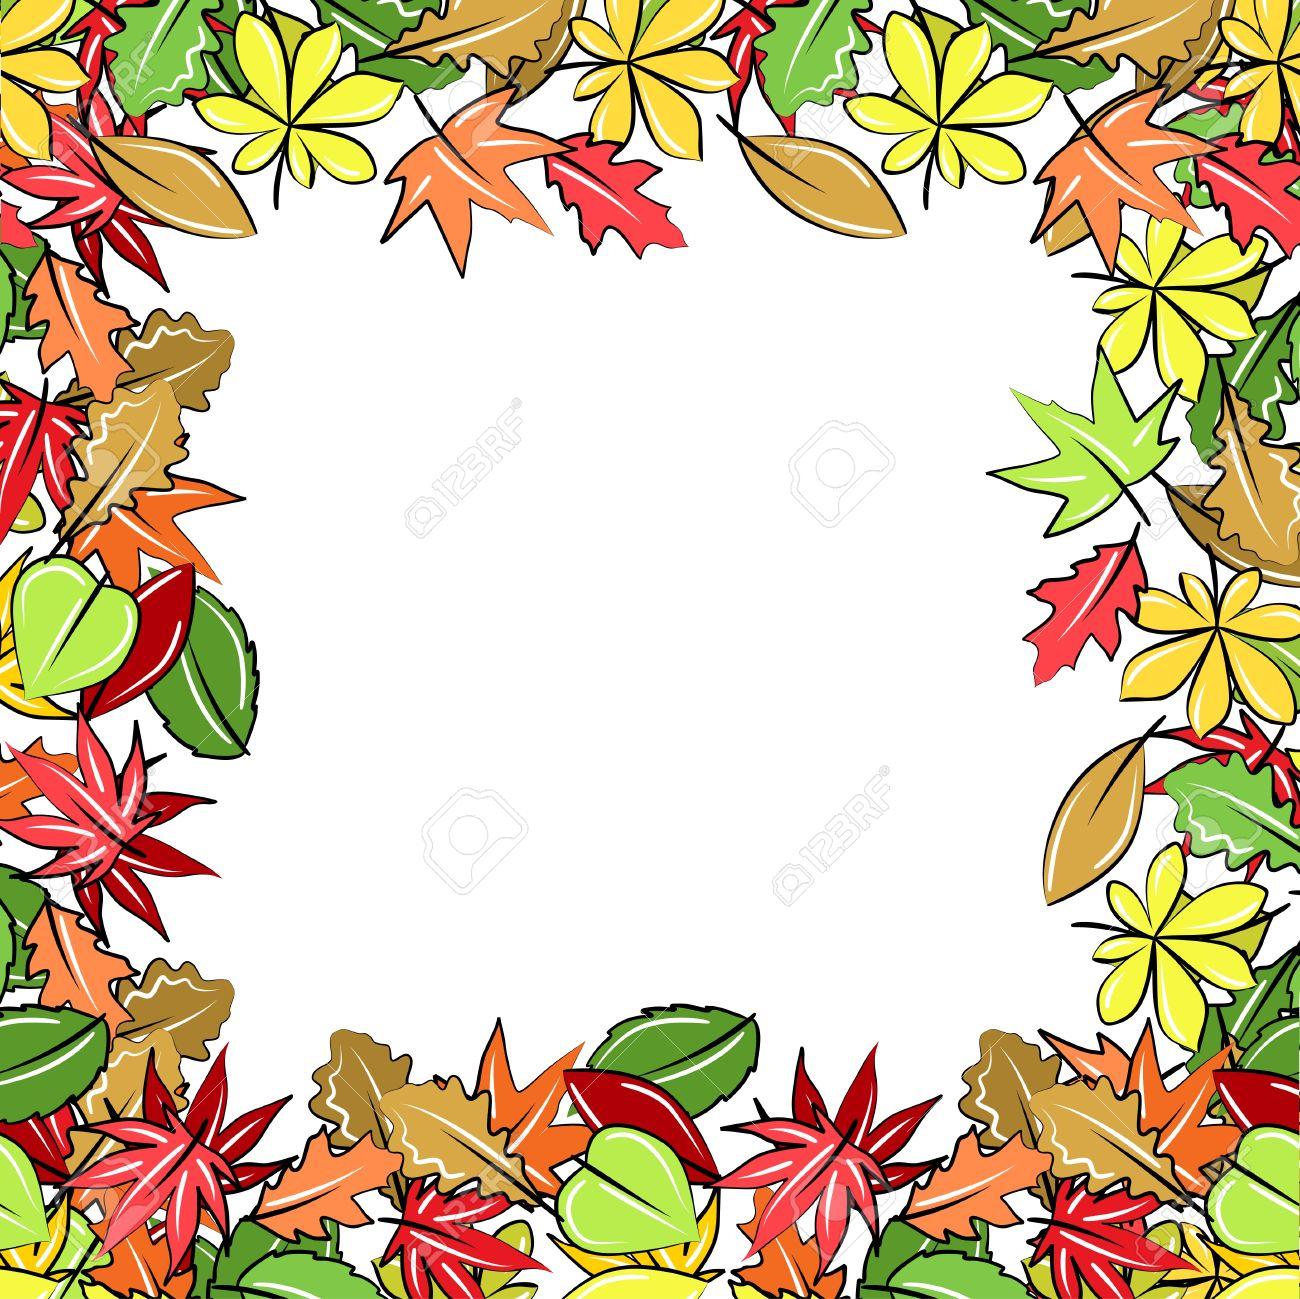 1300x1299 Autumn Leaves Borders Clipart